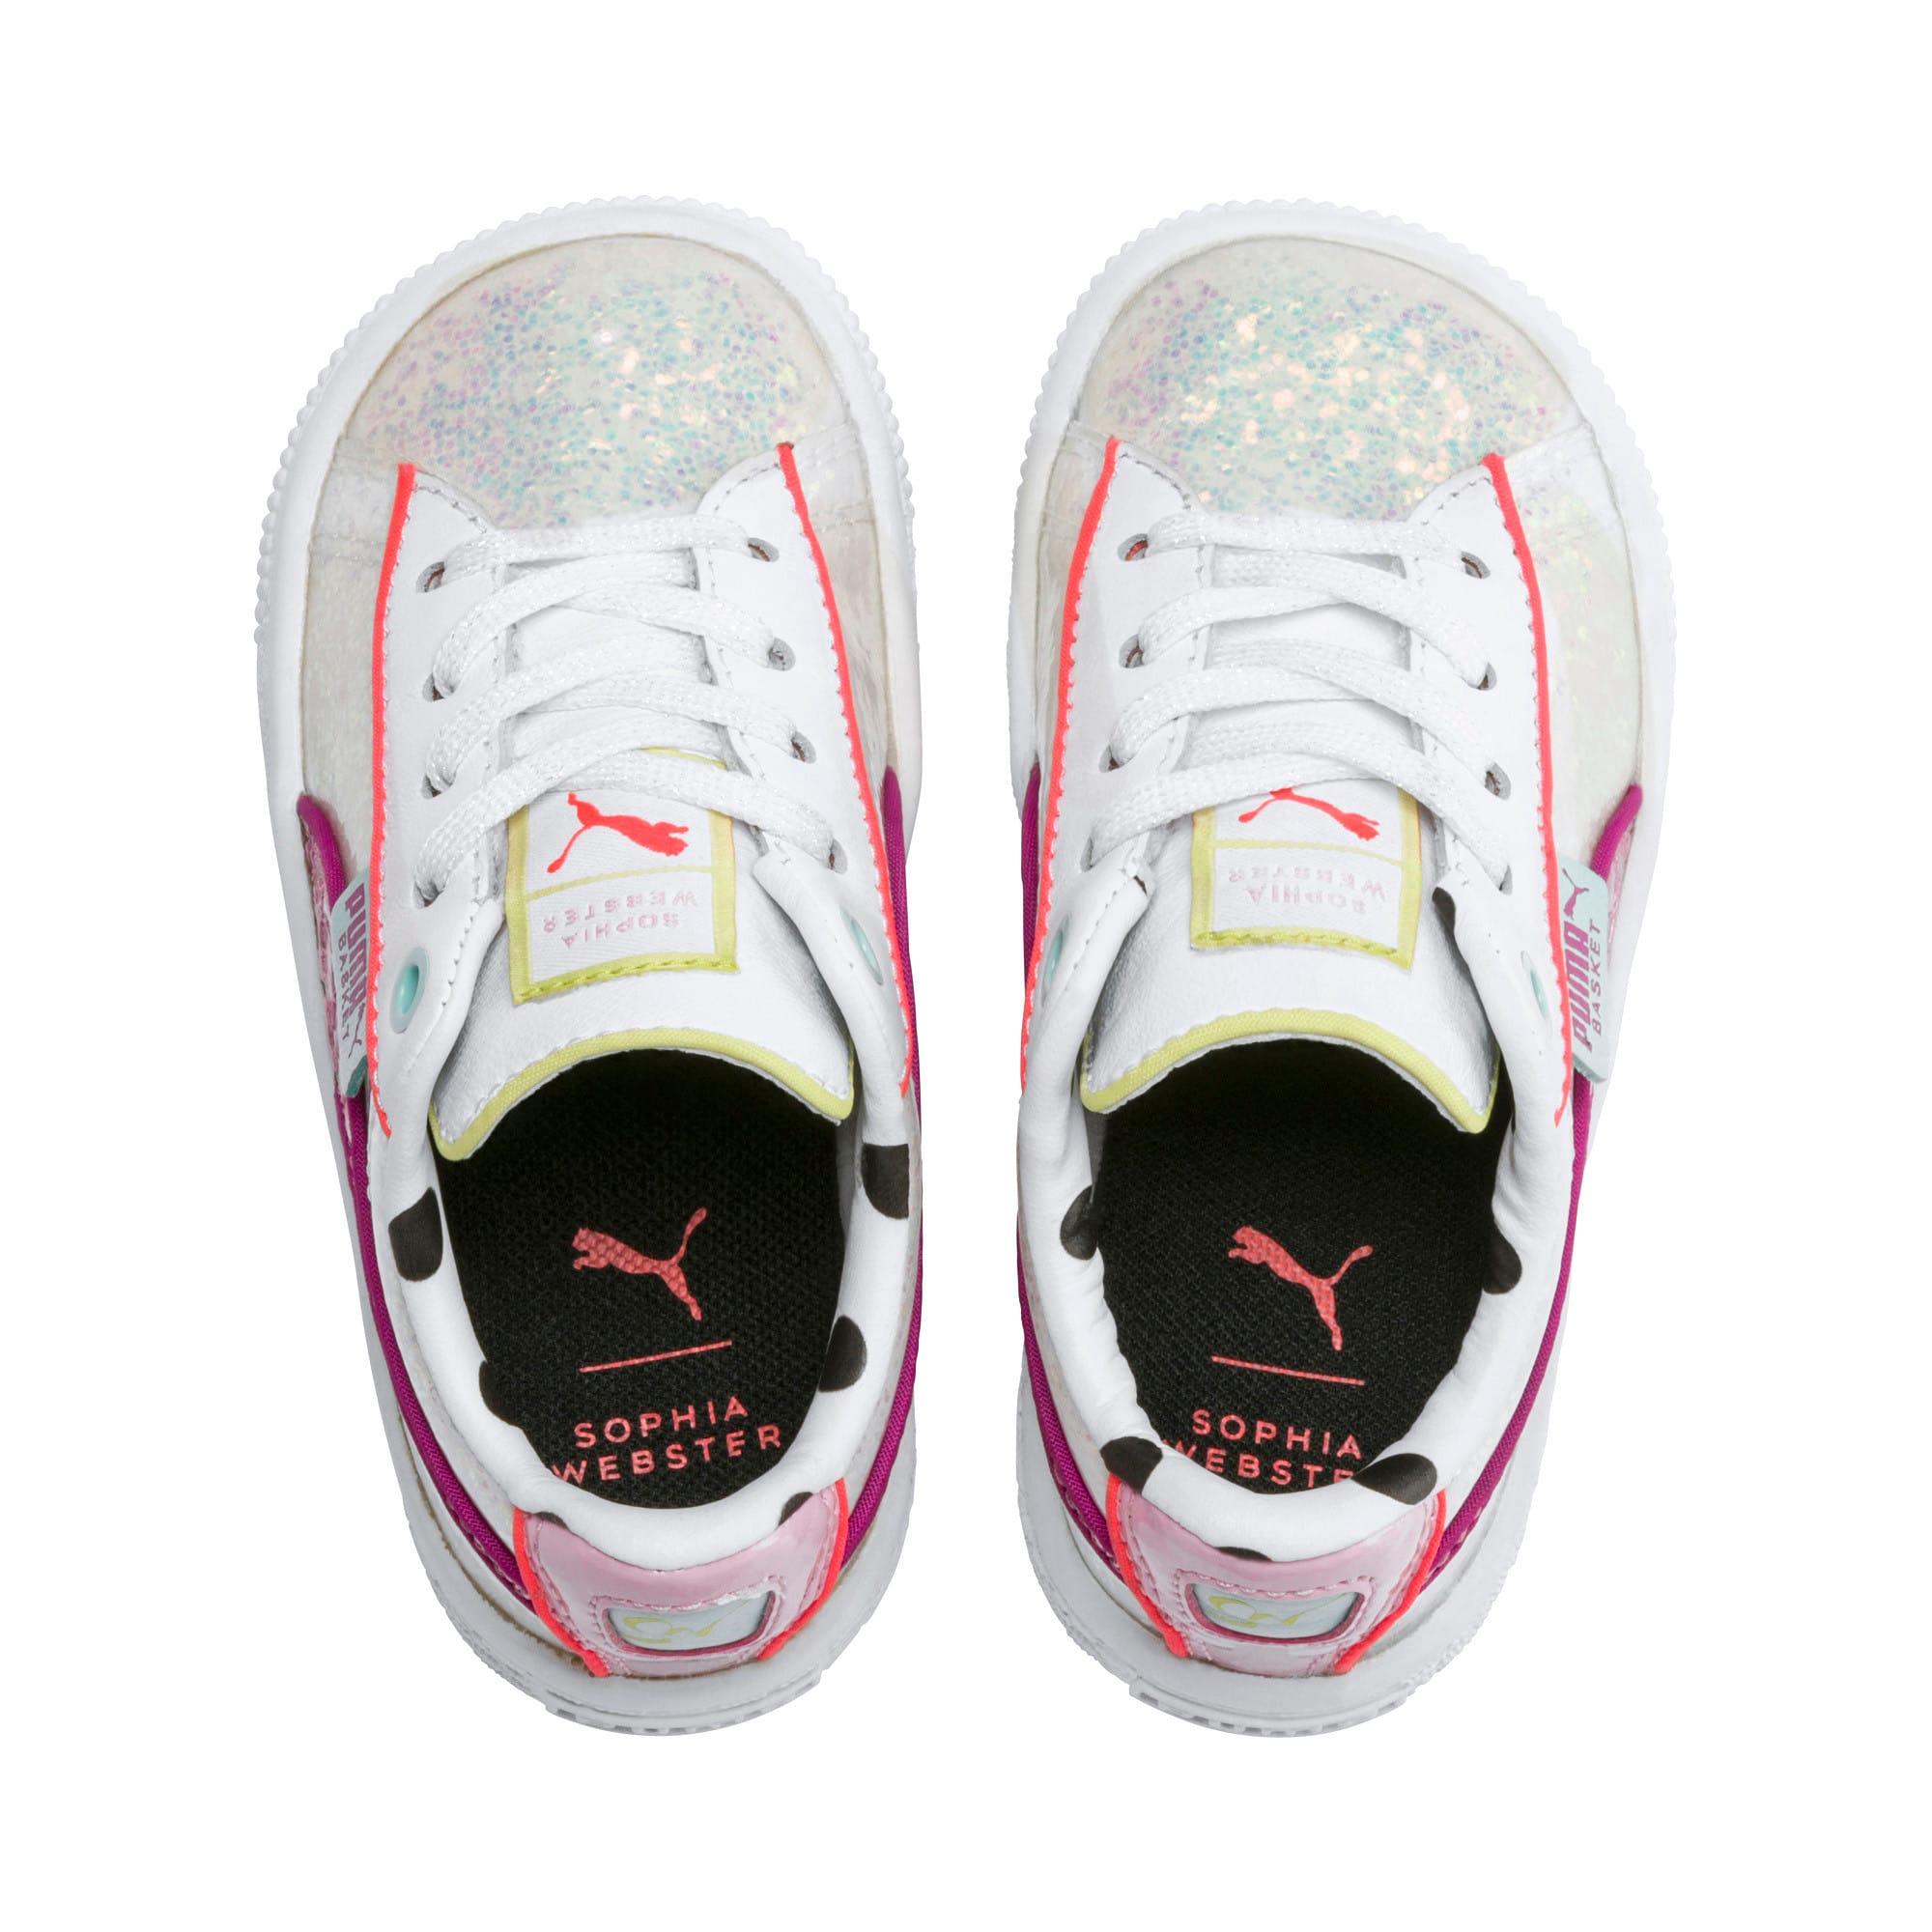 Thumbnail 6 of PUMA x SOPHIA WEBSTER Basket Toddler Shoes, Puma White-Pale Pink, medium